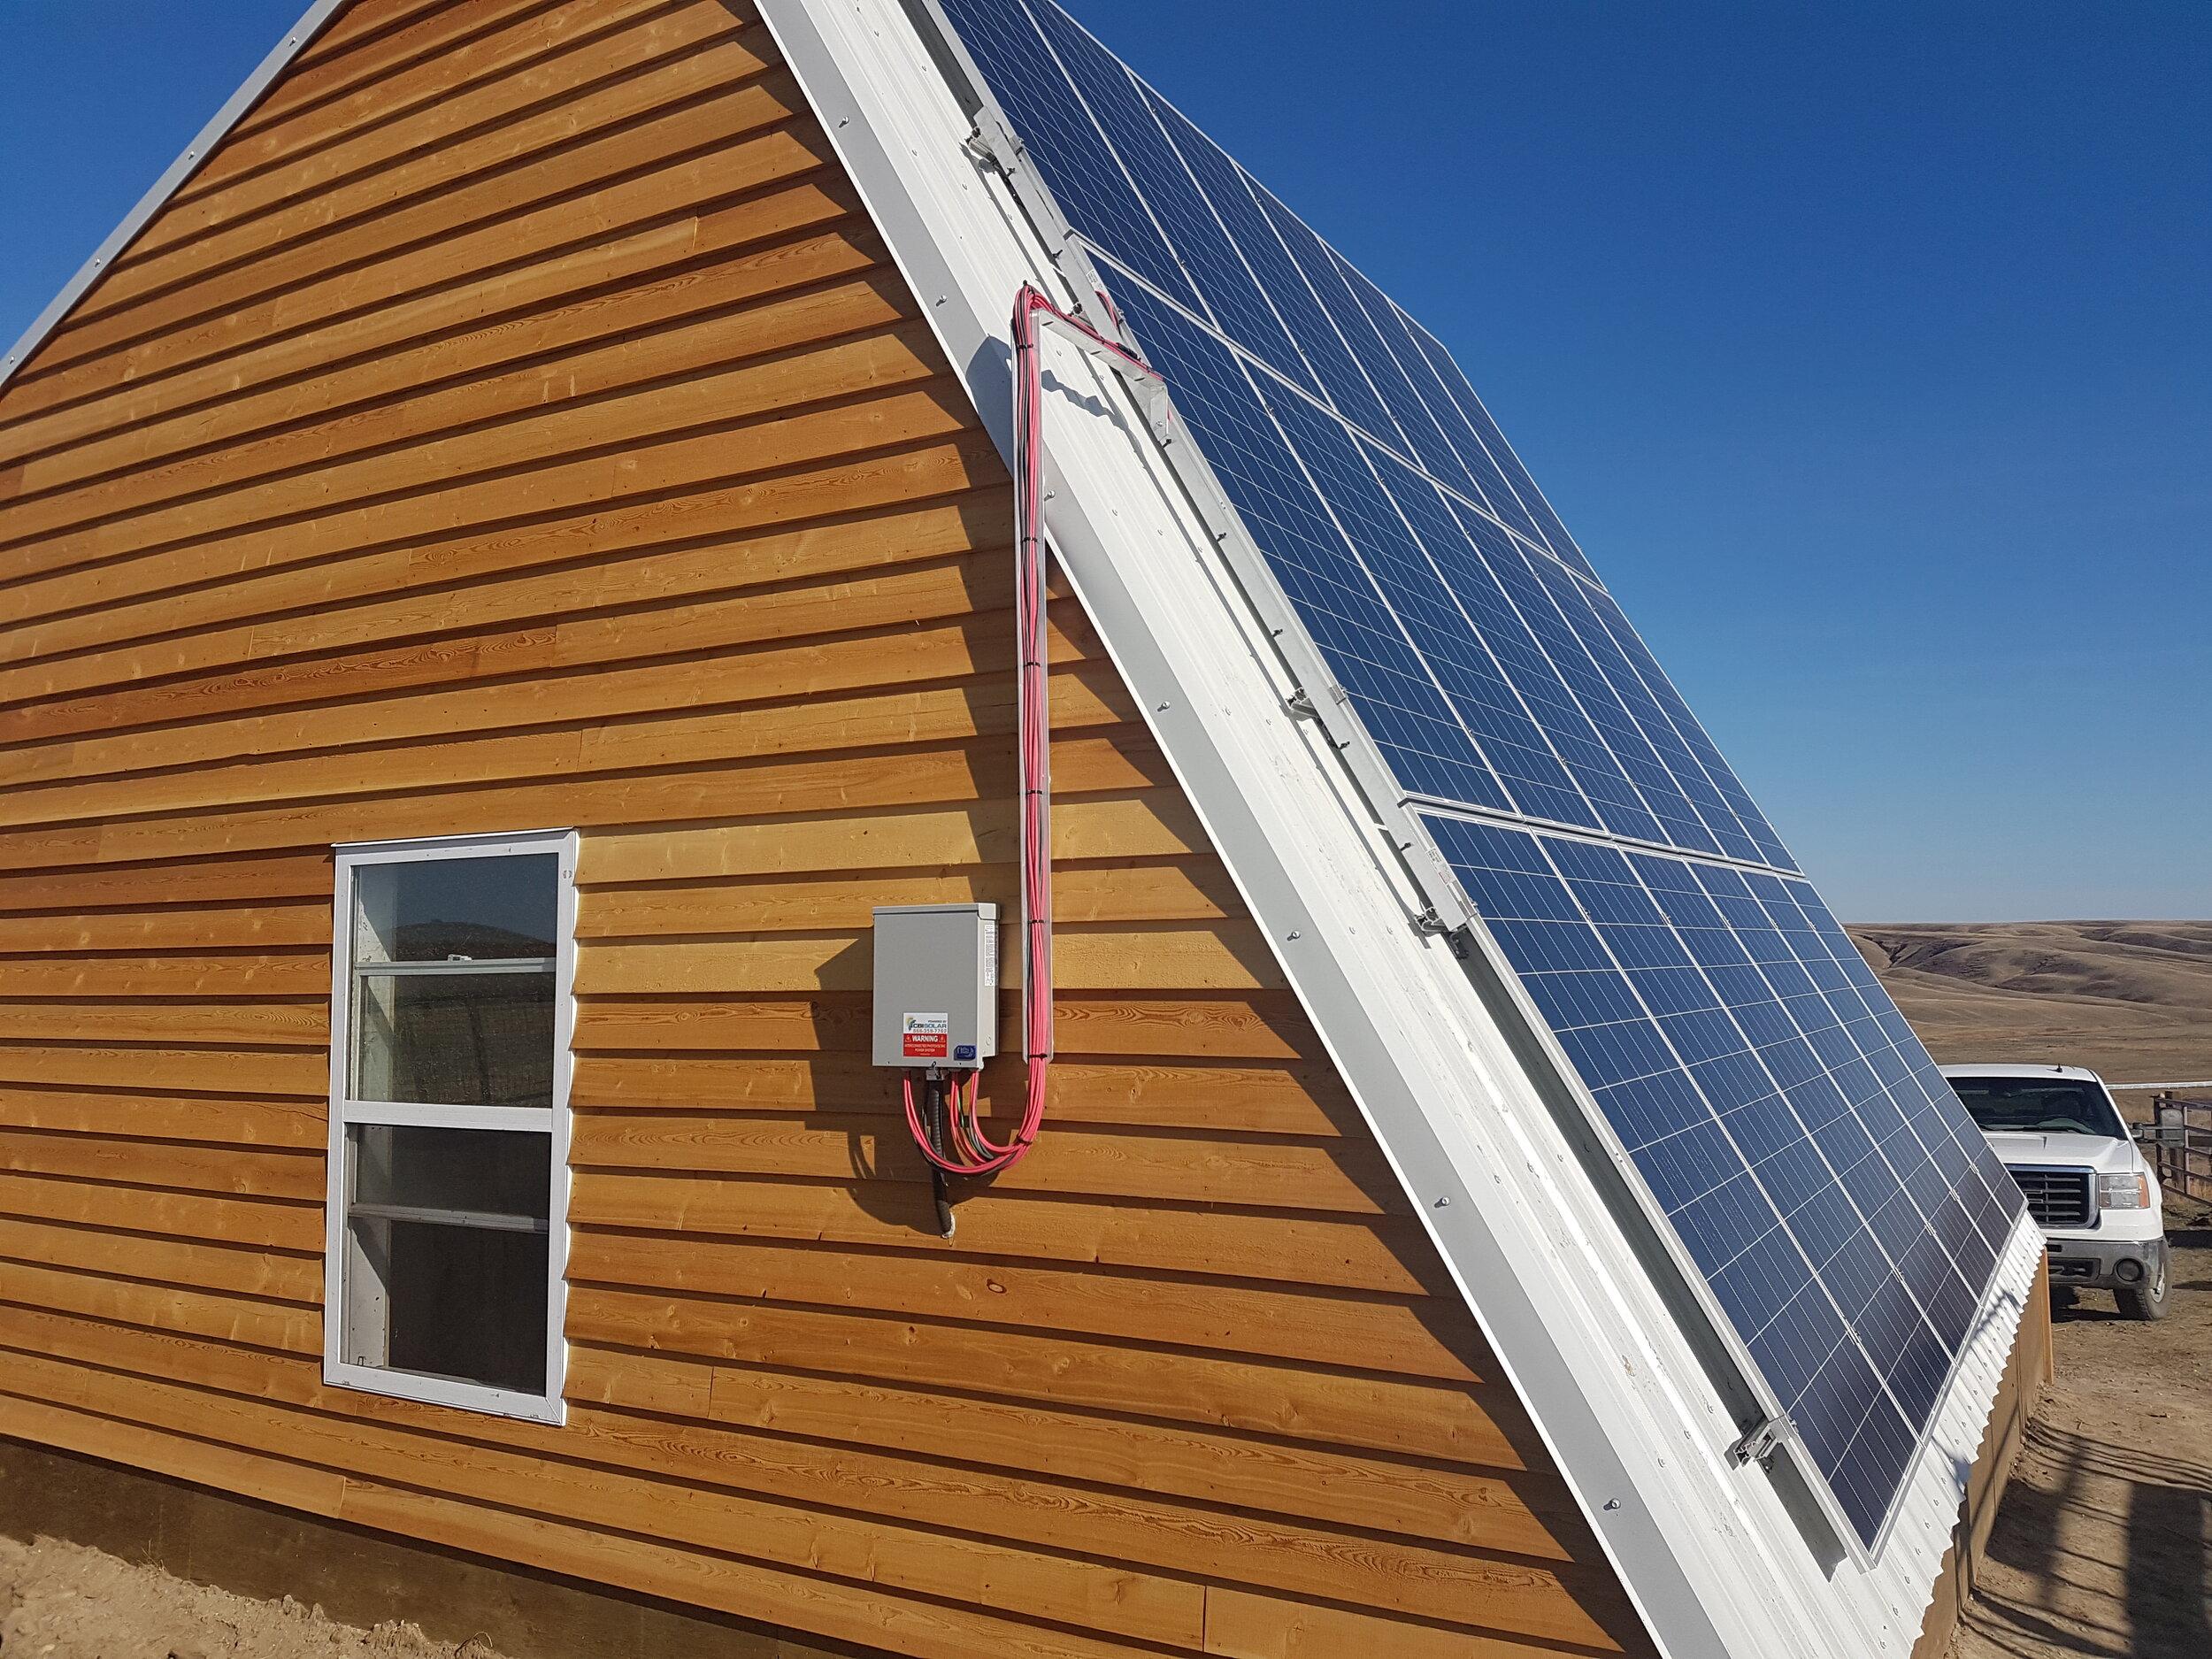 OFF-GRID PROJCET - 5.8 kWs of solar, 6.8 kW inverter, 6 kW genset, 40 kWs of battery storage in Southern Alberta.